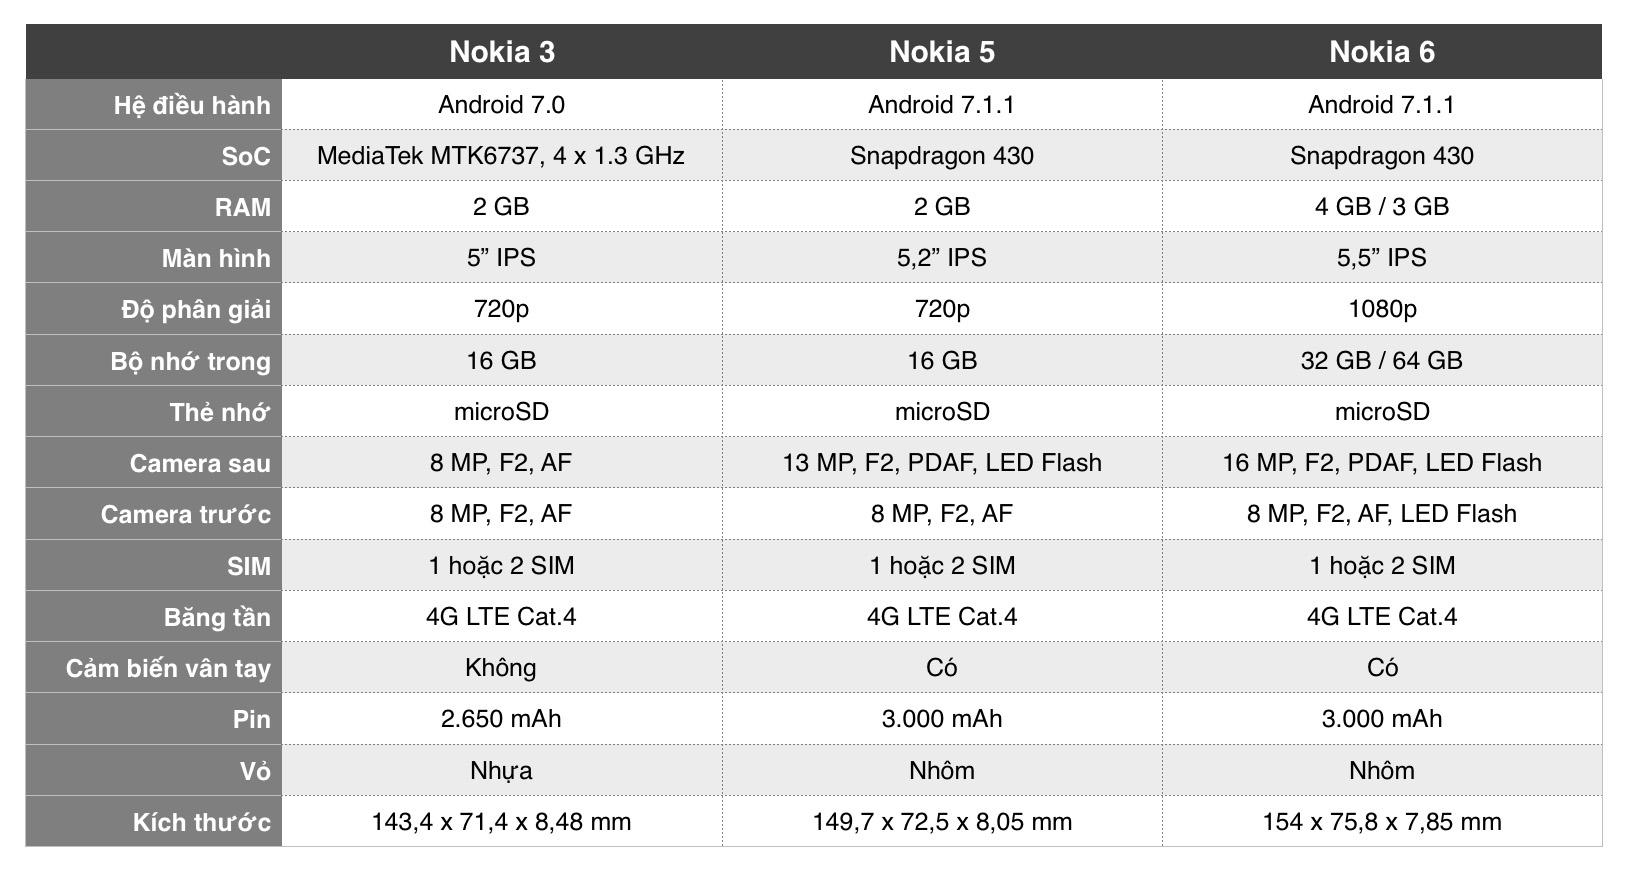 nokia356-specs.jpg